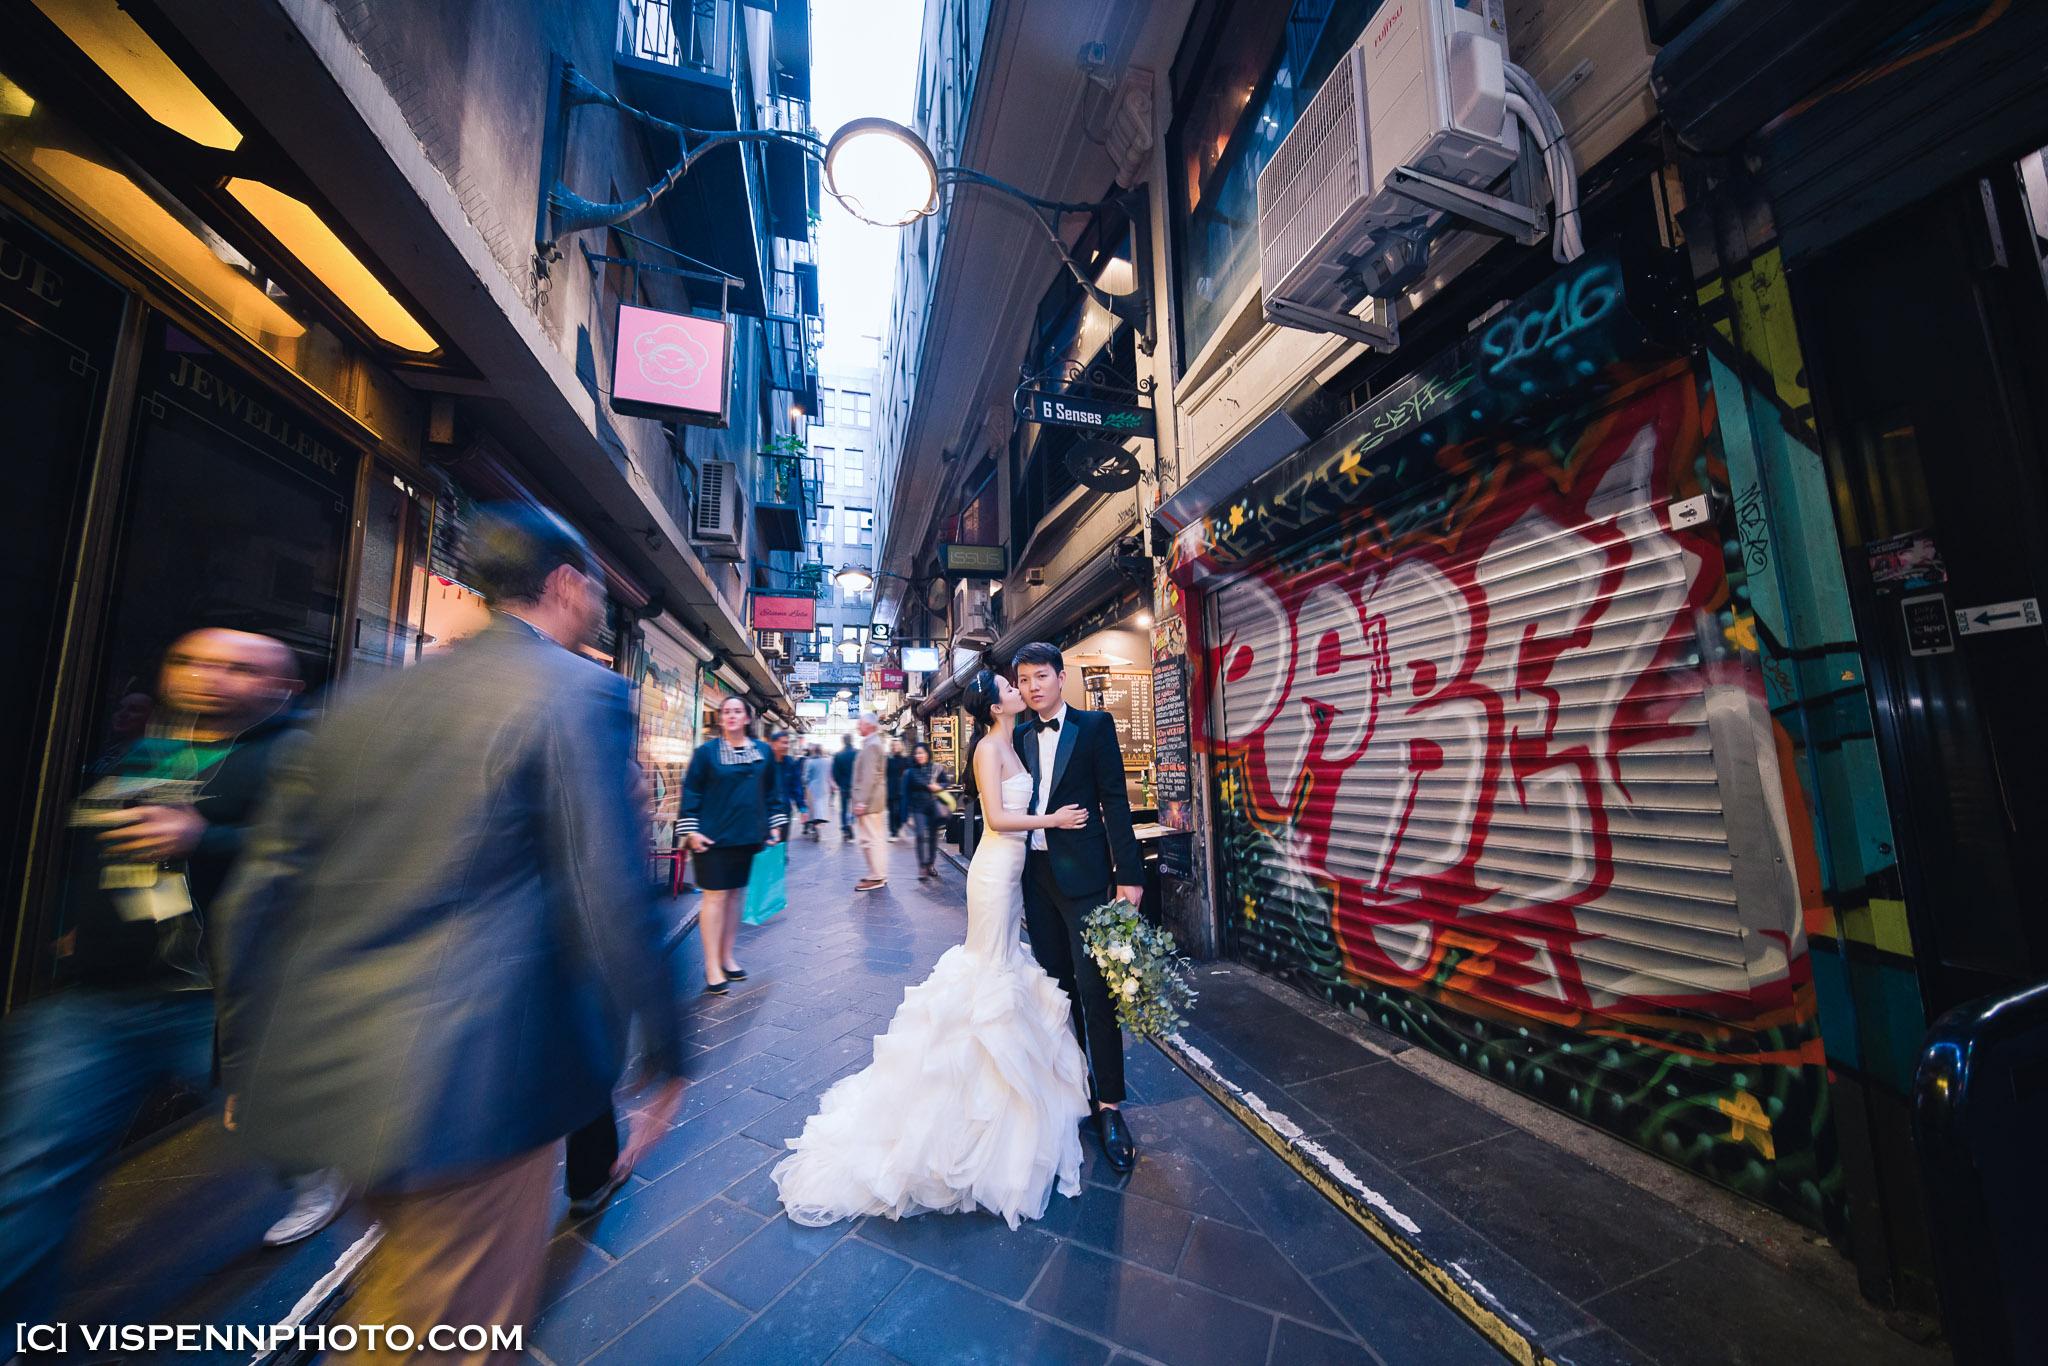 PRE WEDDING Photography Melbourne VISPENN 墨尔本 婚纱照 结婚照 婚纱摄影 DSC04647